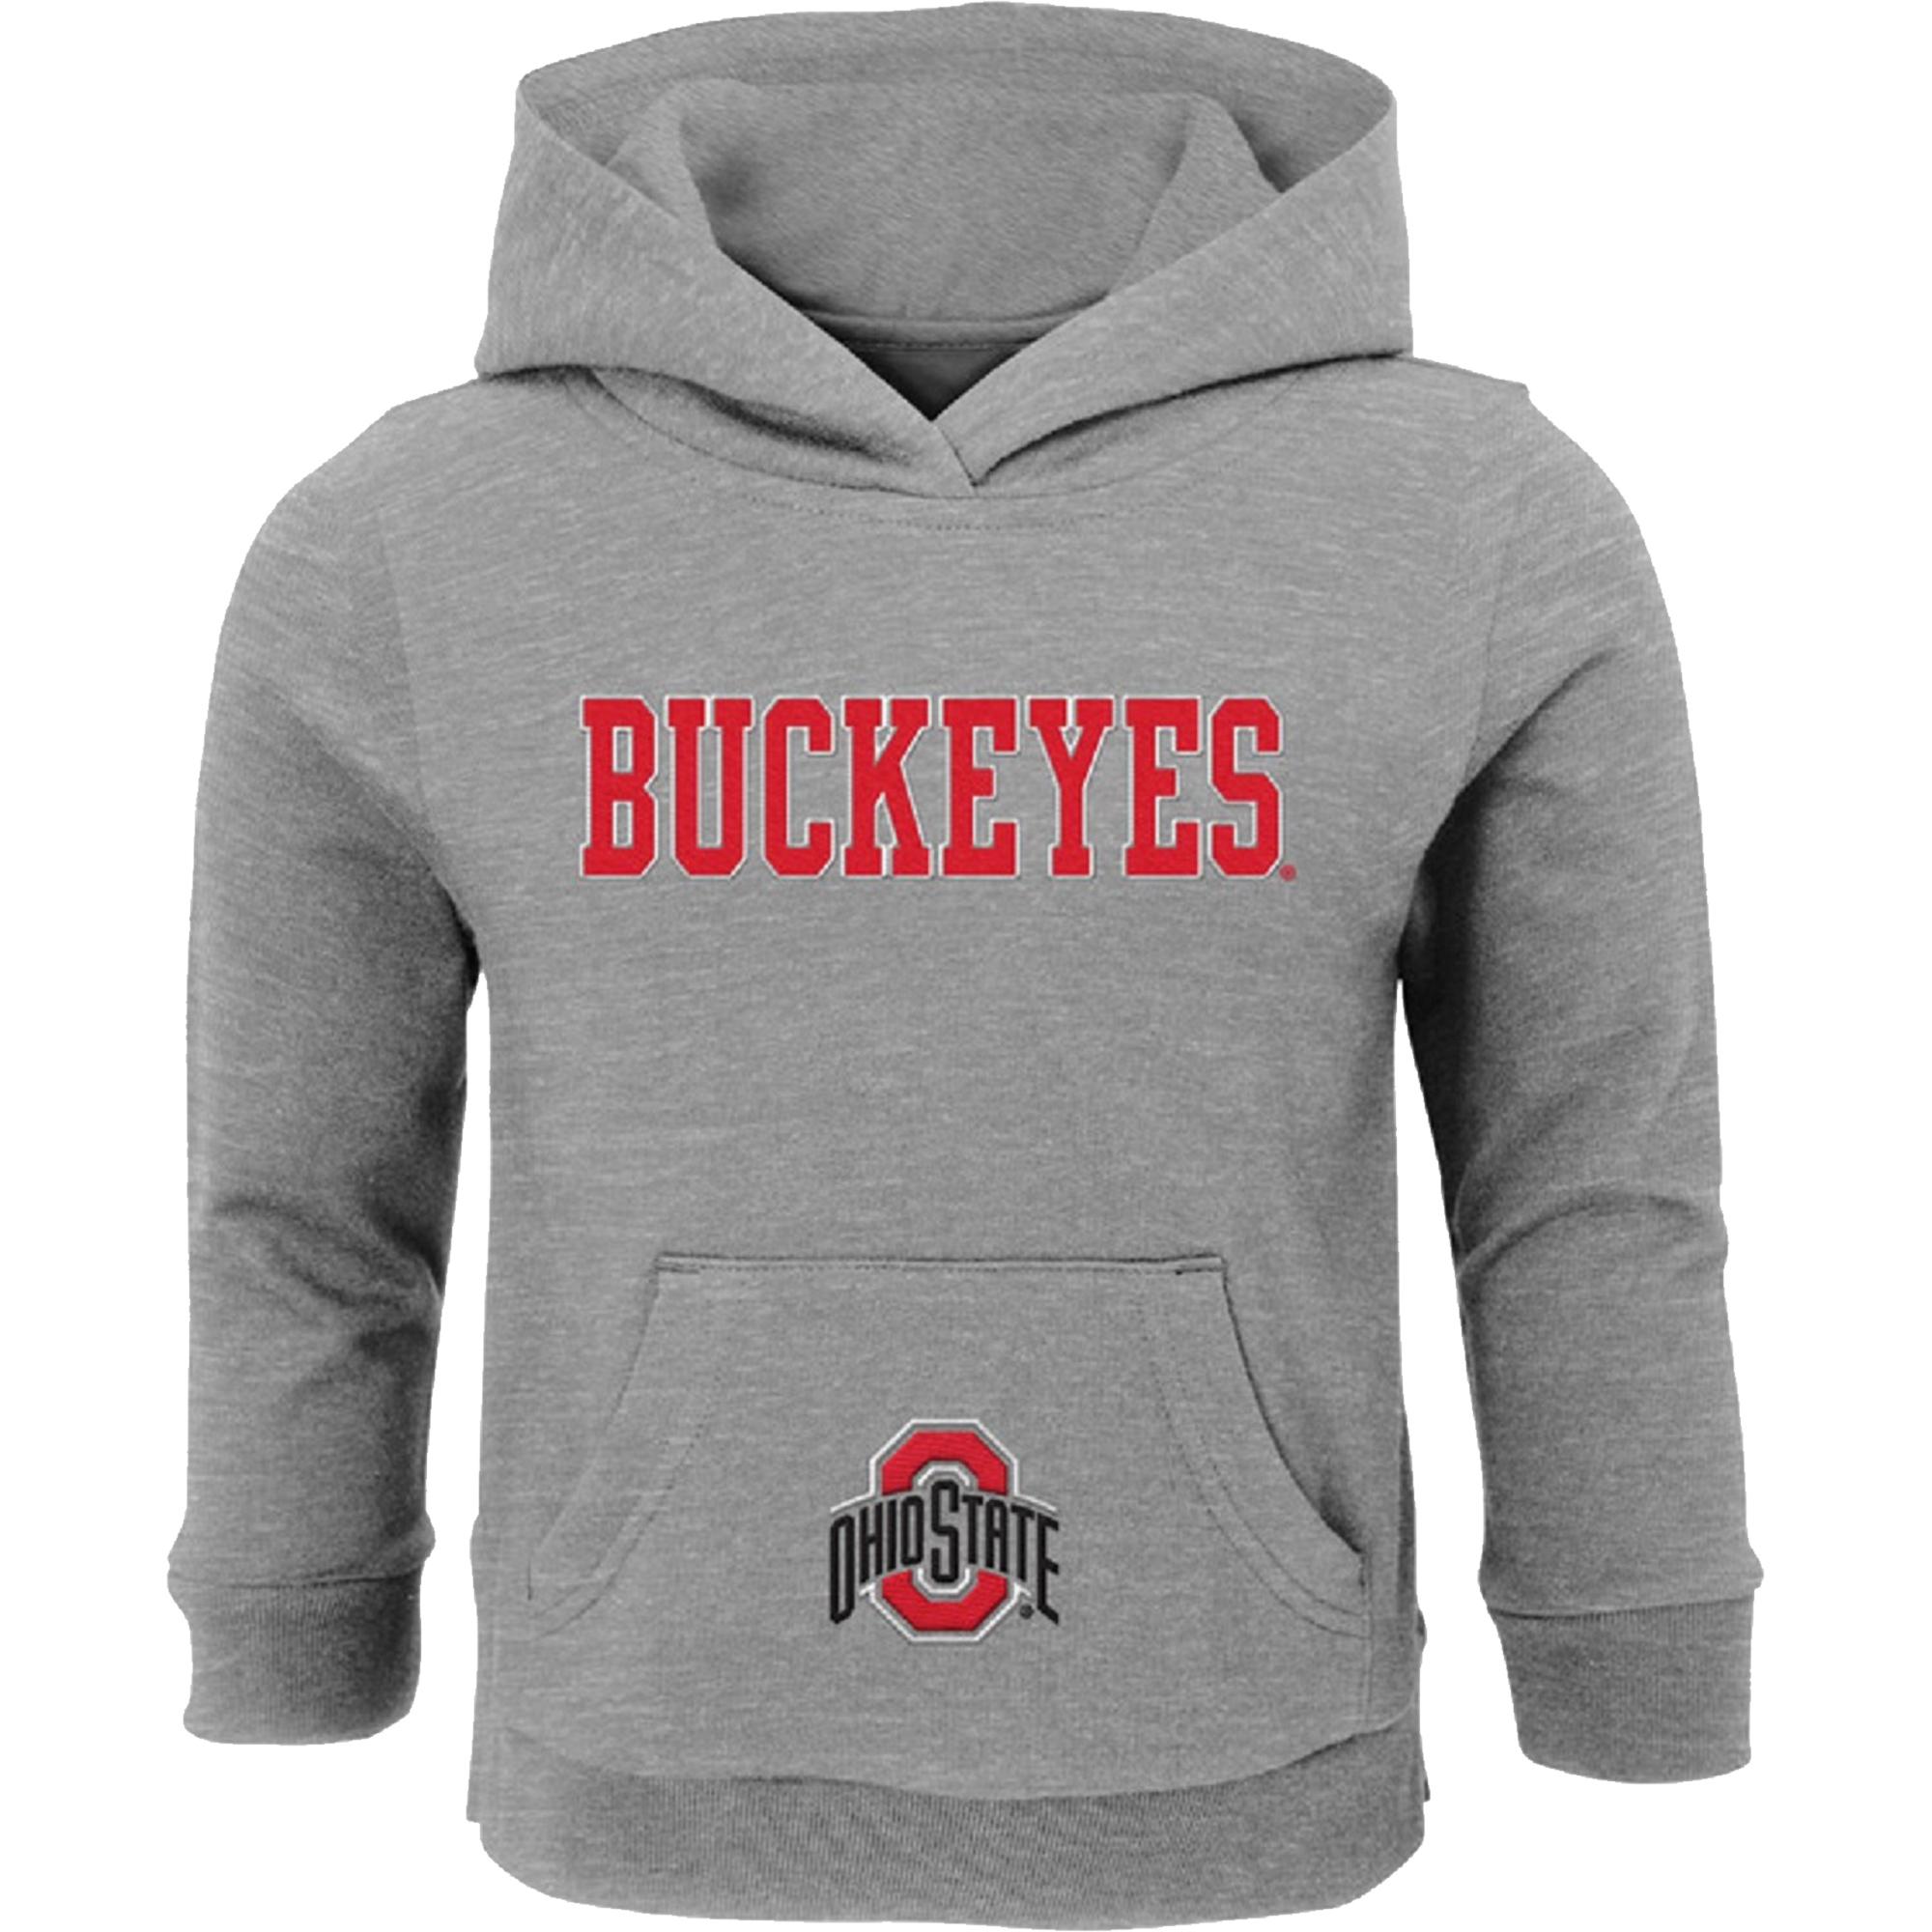 Preschool & Toddler Gray Ohio State Buckeyes Team Logo Fleece Hoodie